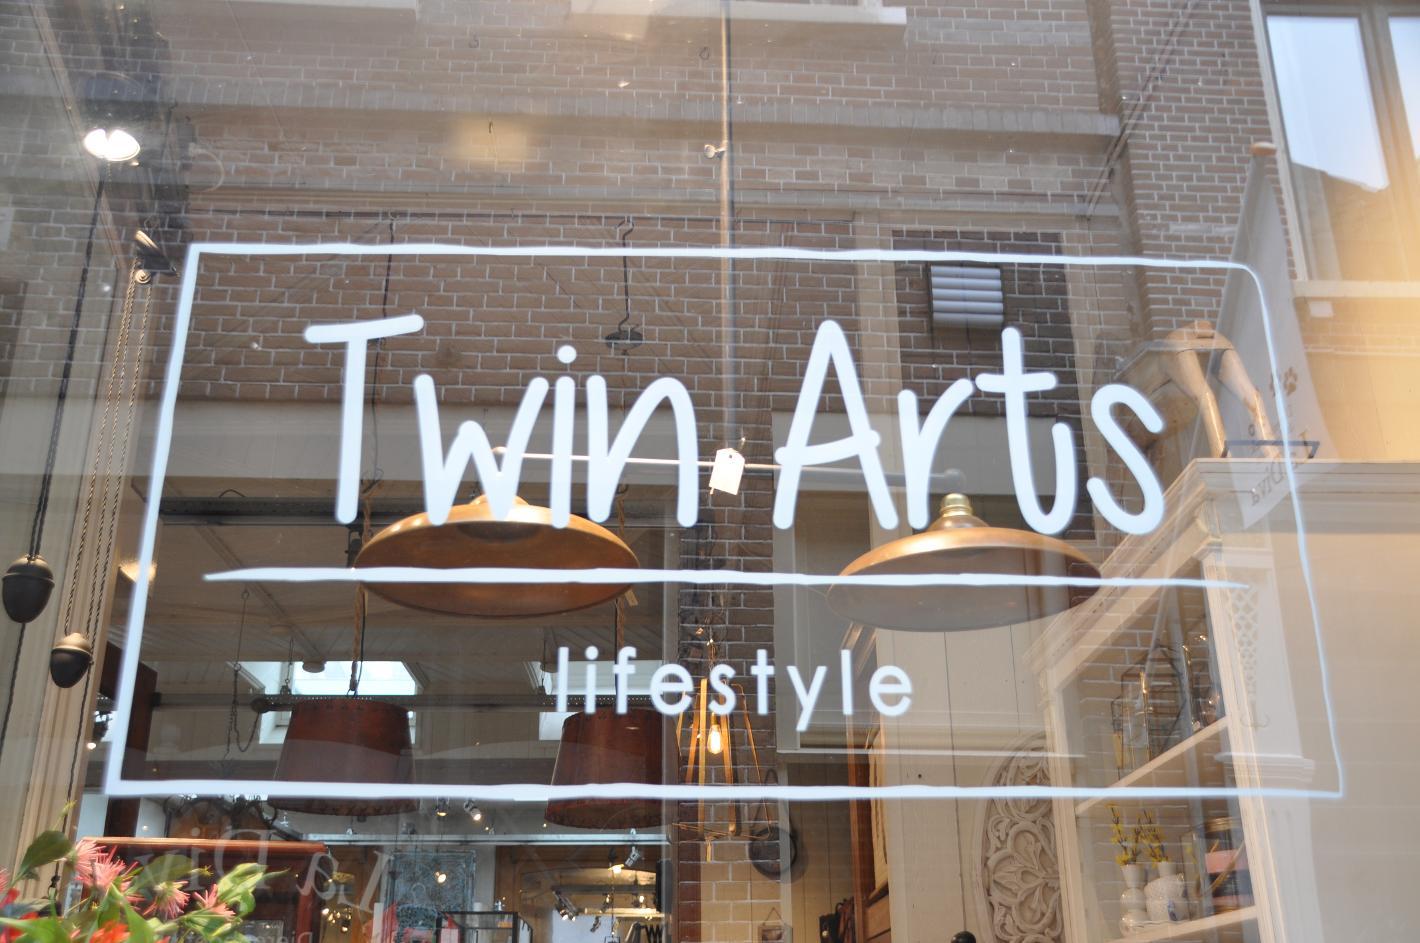 Stoere Meubels Alkmaar : Kado wonen alkmaar twin arts lifestyle woonwinkel landelijk stoer